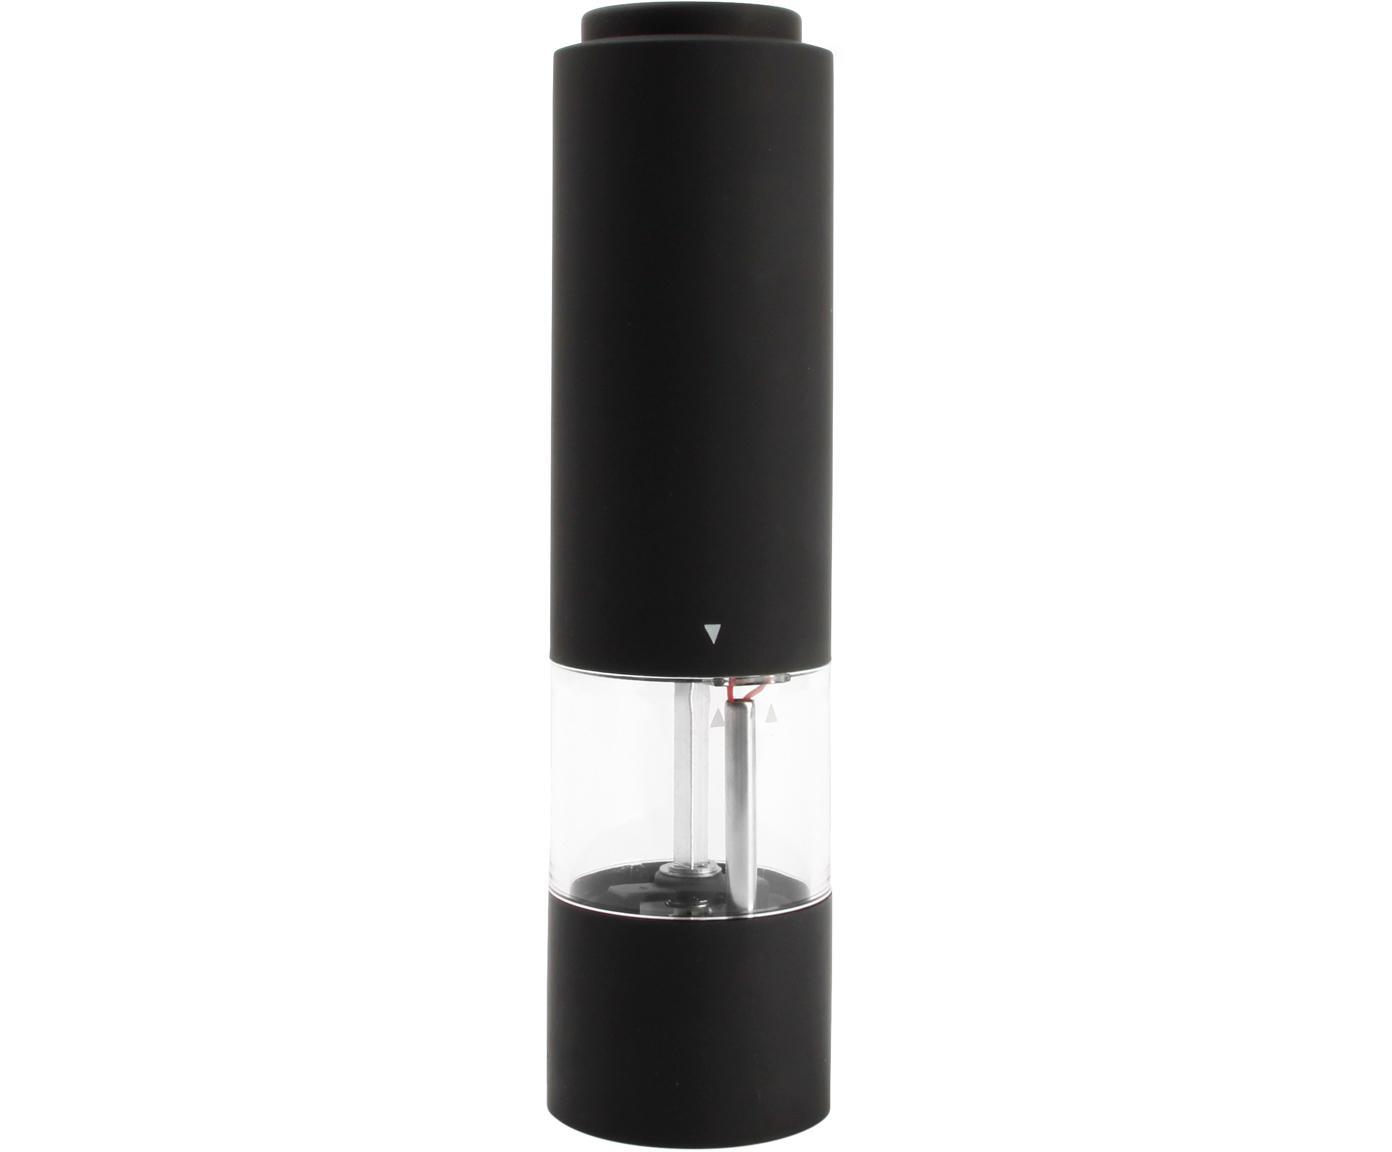 Zout- en pepermolen Lecta in zwart, Acryl, kunststof (ABS), rubber, keramiek, Zwart, transparant, zilverkleurig, Ø 5 x H 19 cm